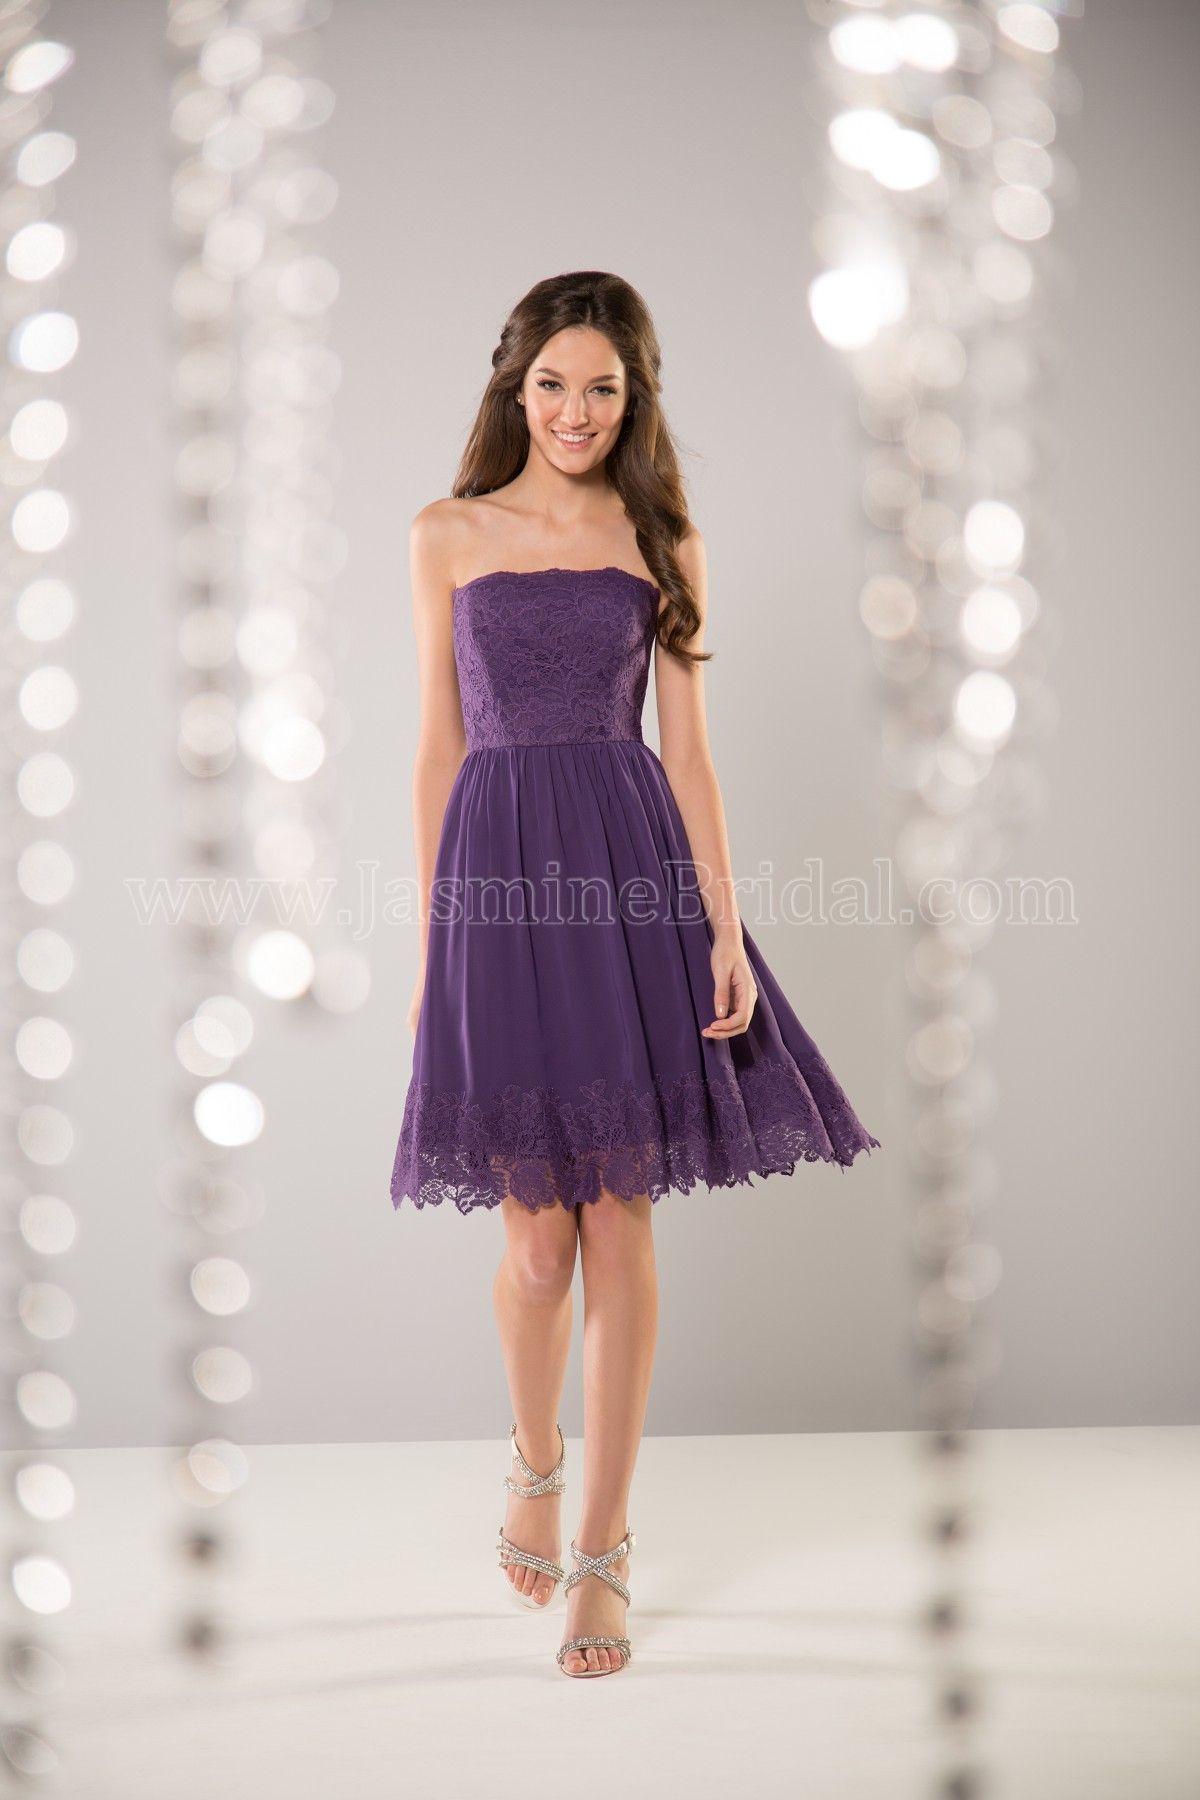 Jasmine Bridal in Cayman Blue | Bridesmaids | Pinterest